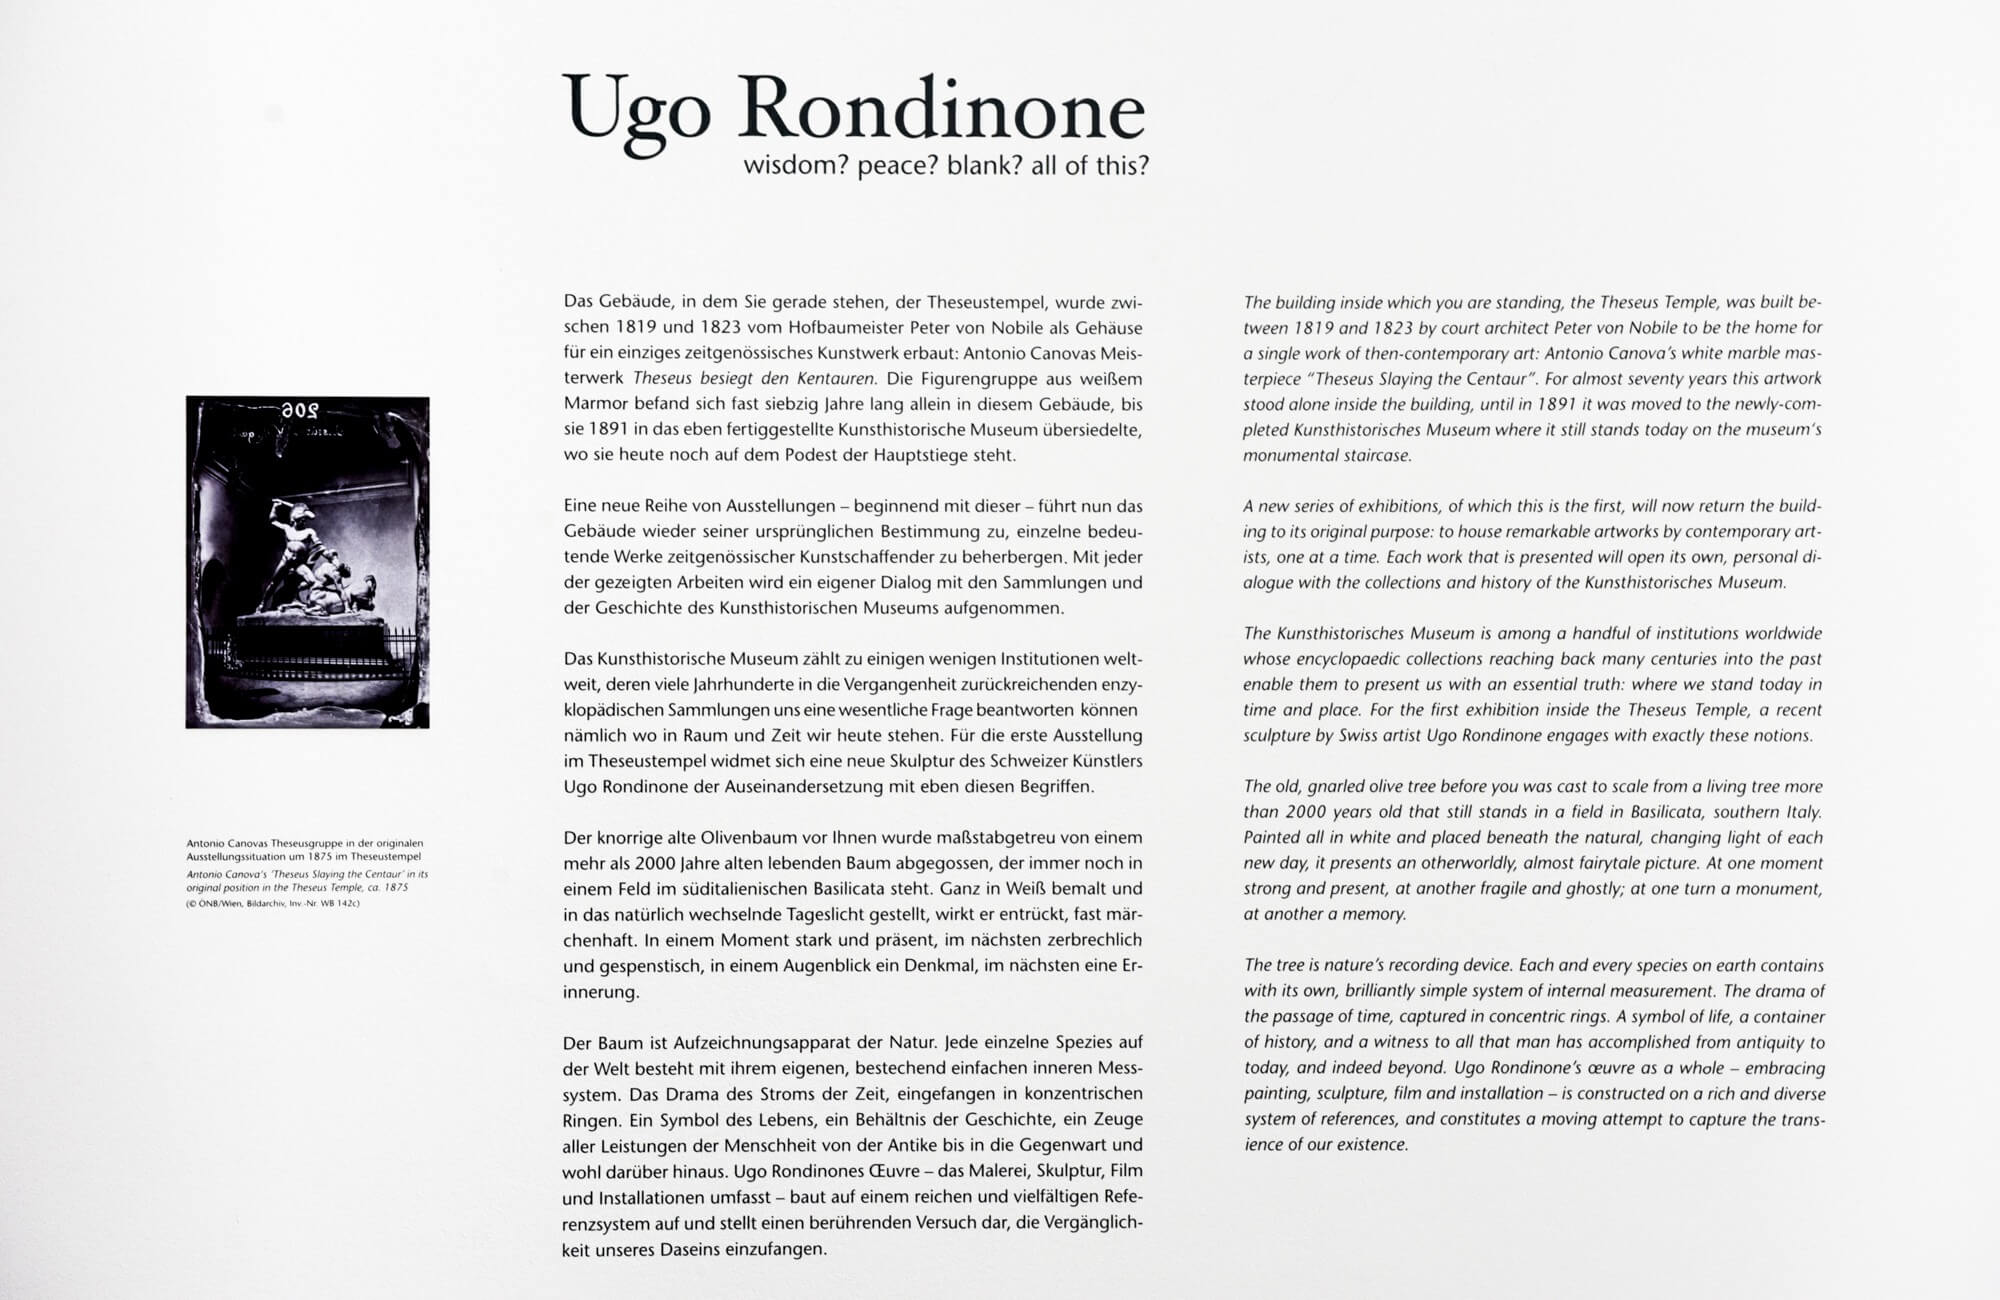 wisdom? peace? blank? all of this? | UGO RONDINONE